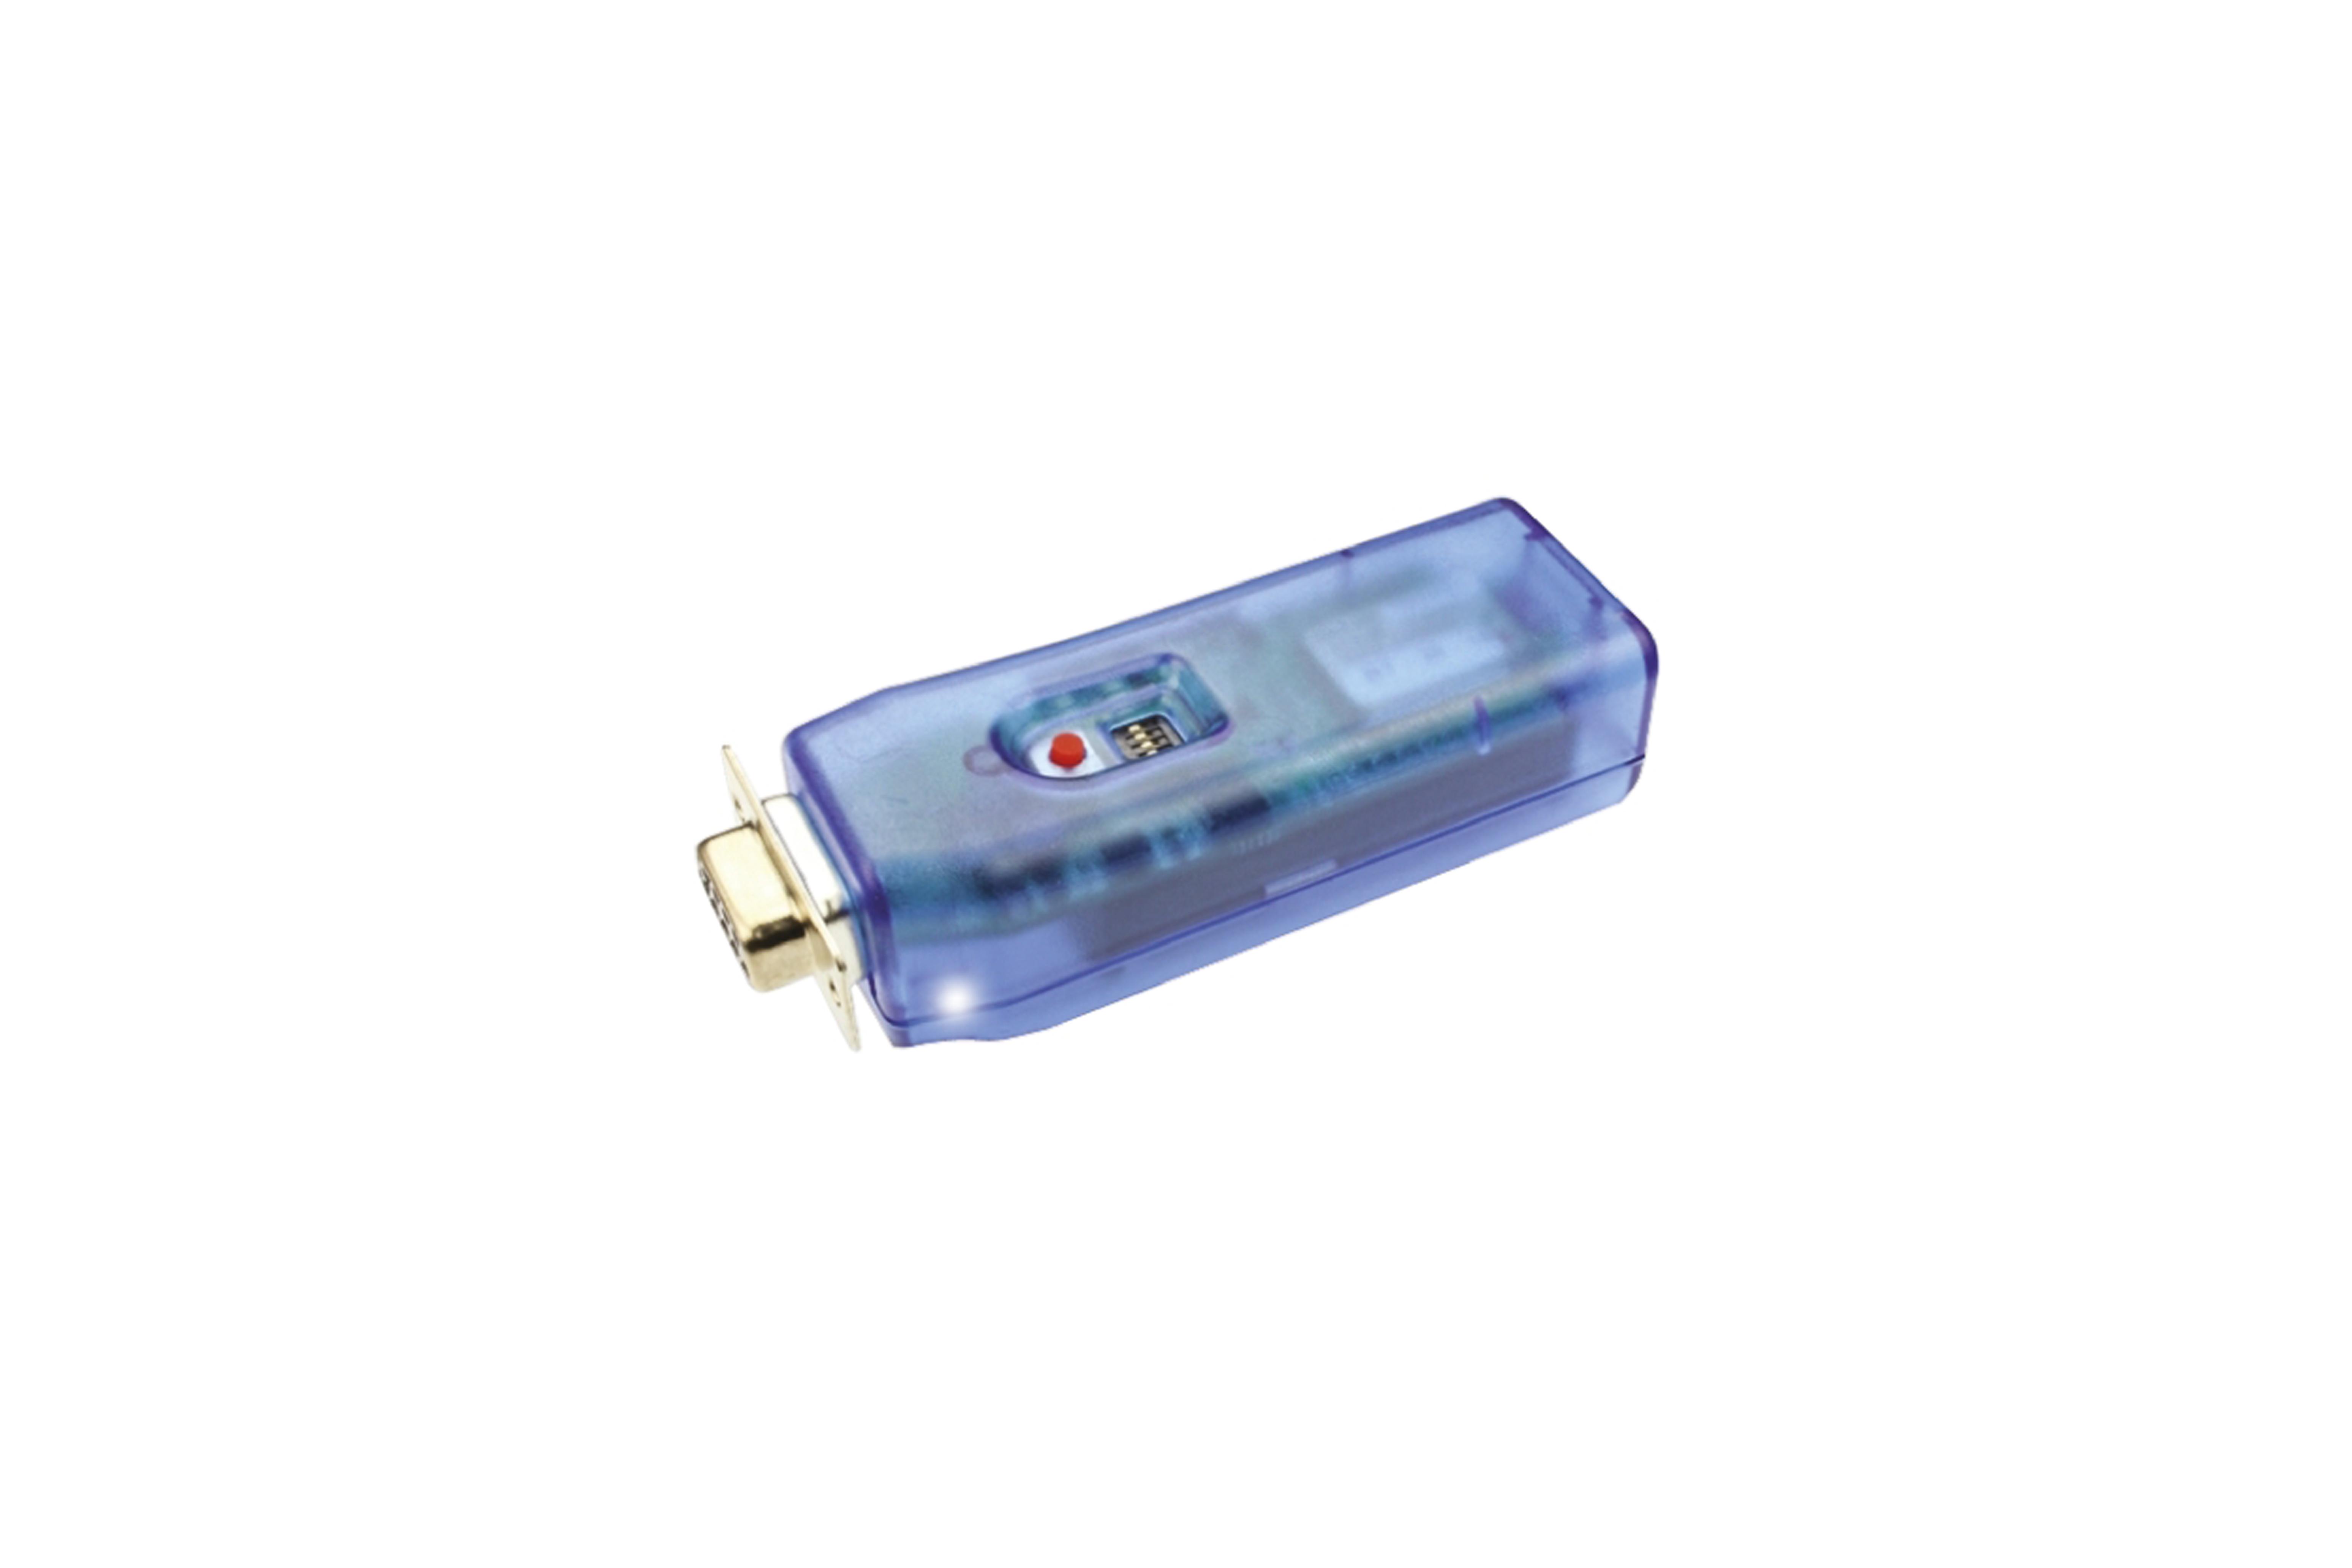 Adattatore Bluetooth, RS232/422, 100m, 232Kbps